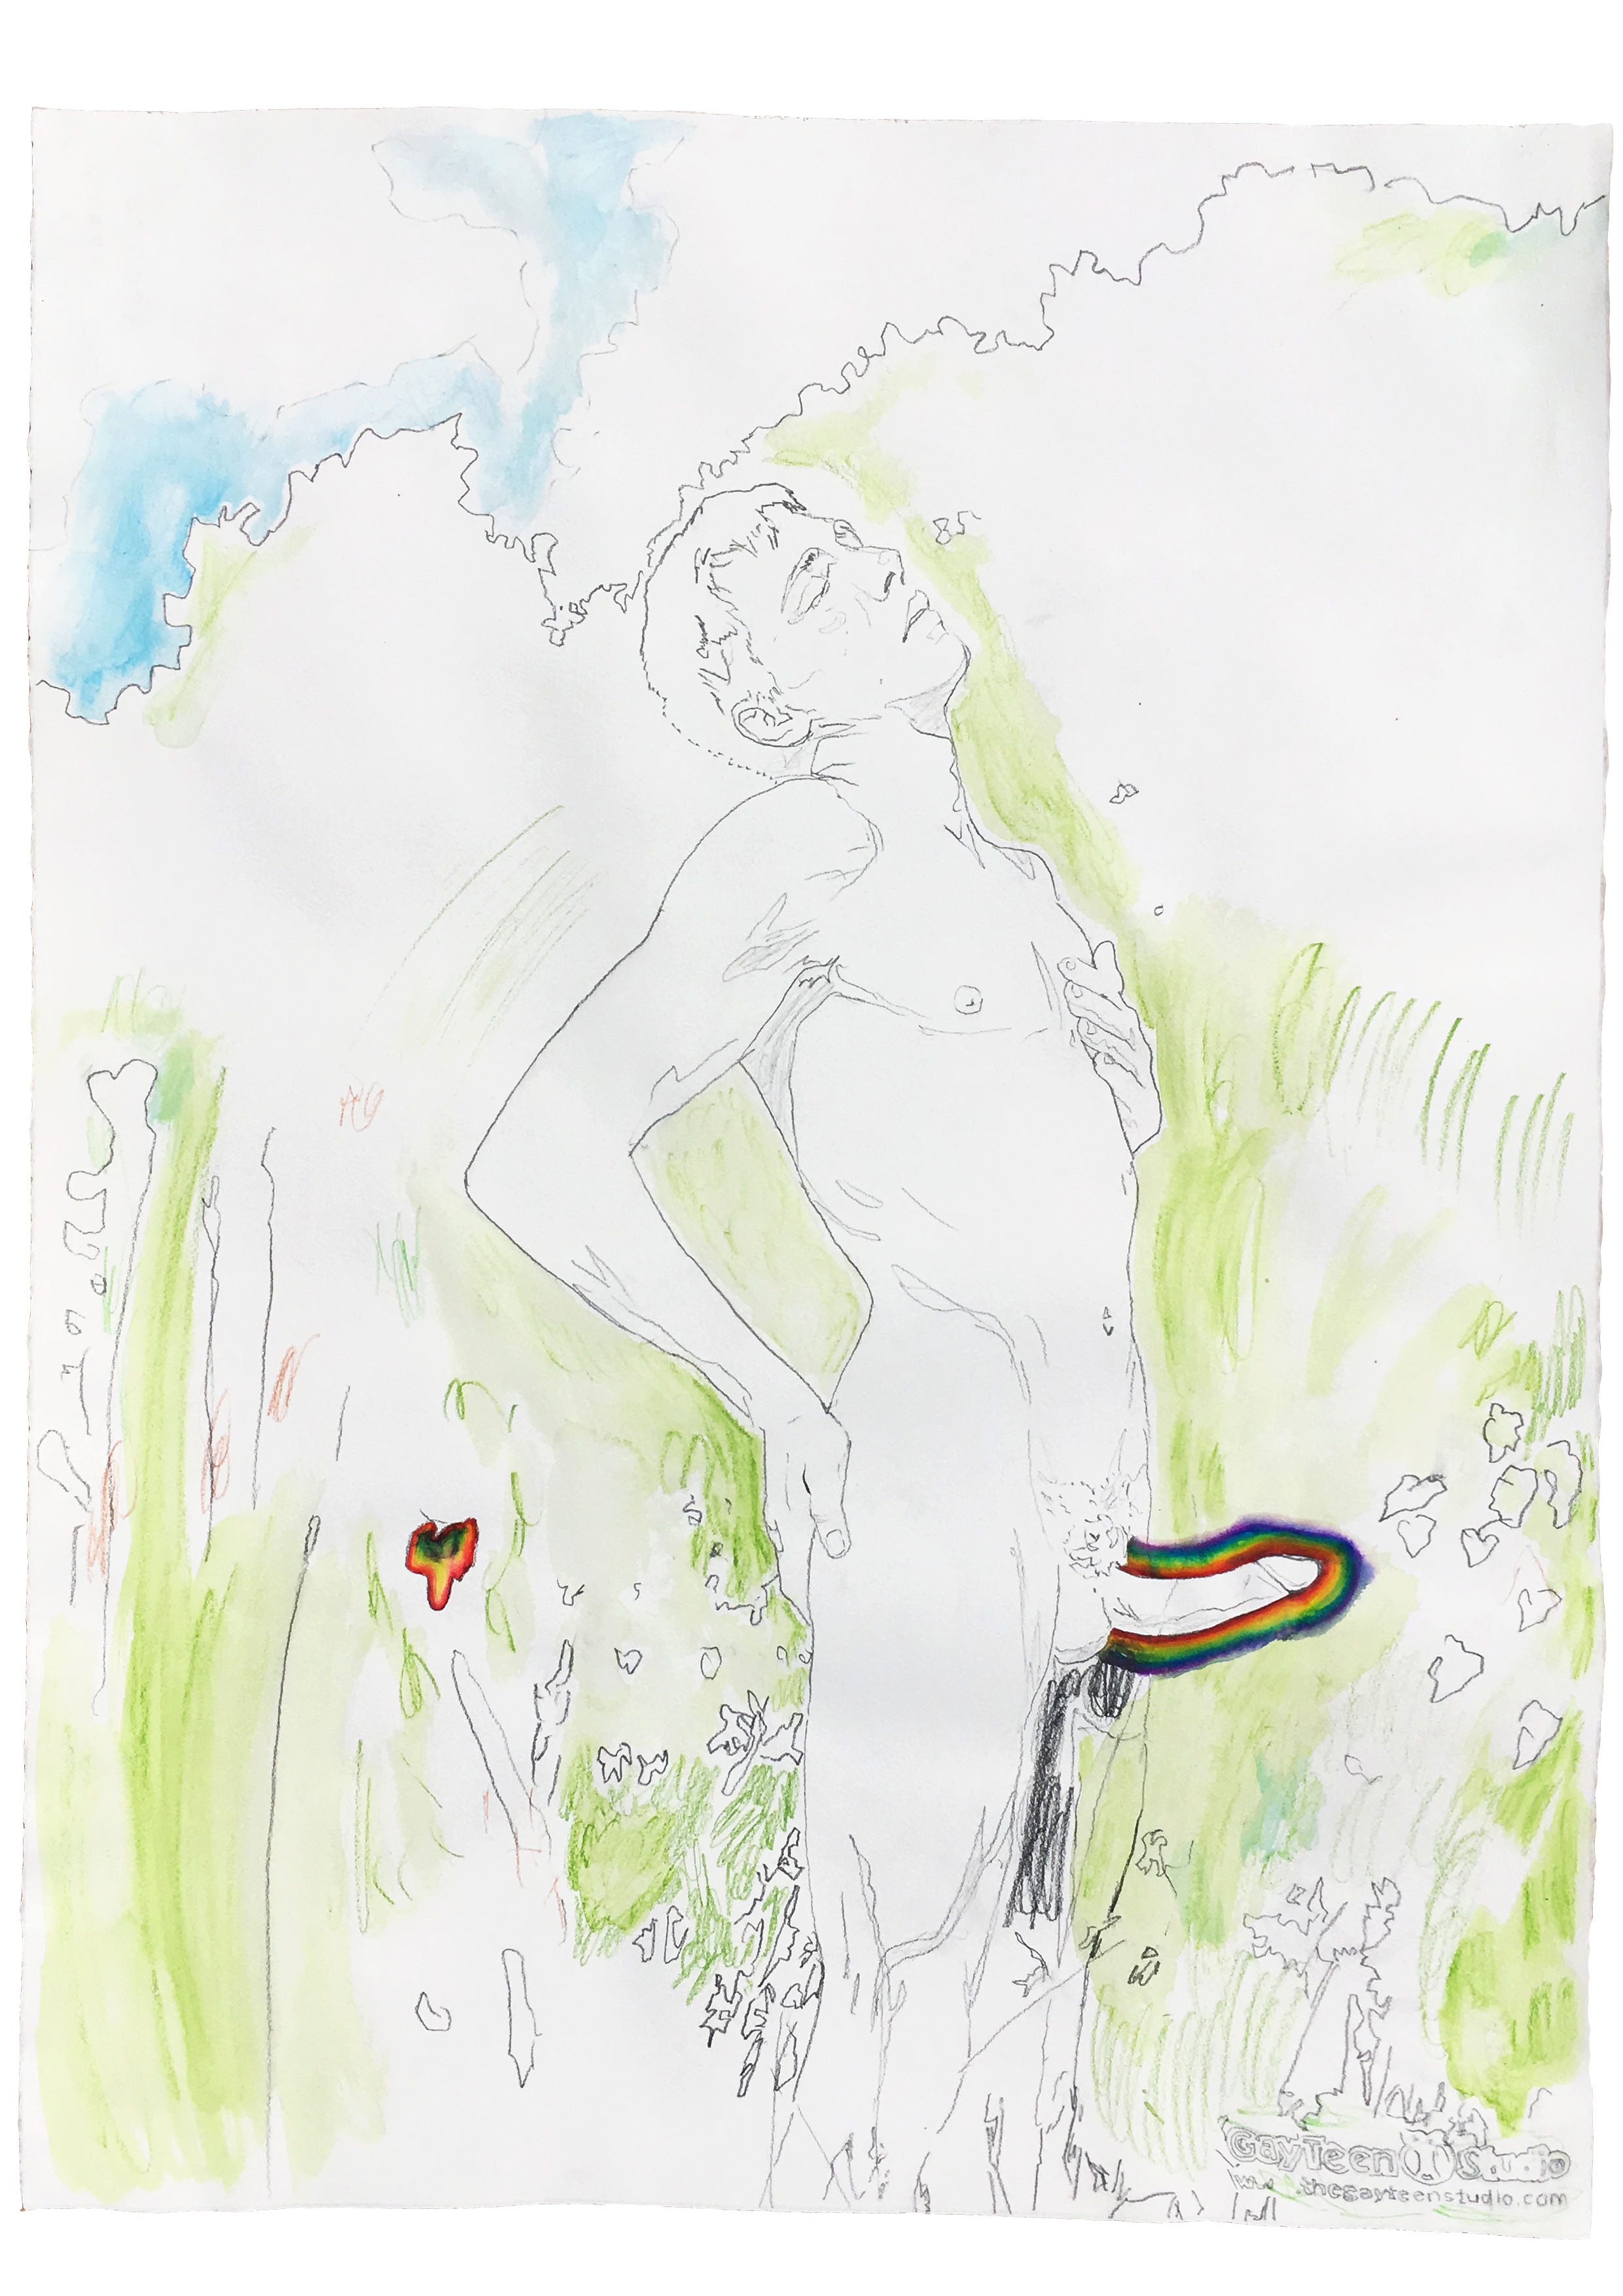 Gay Hippie drawing 5.jpg